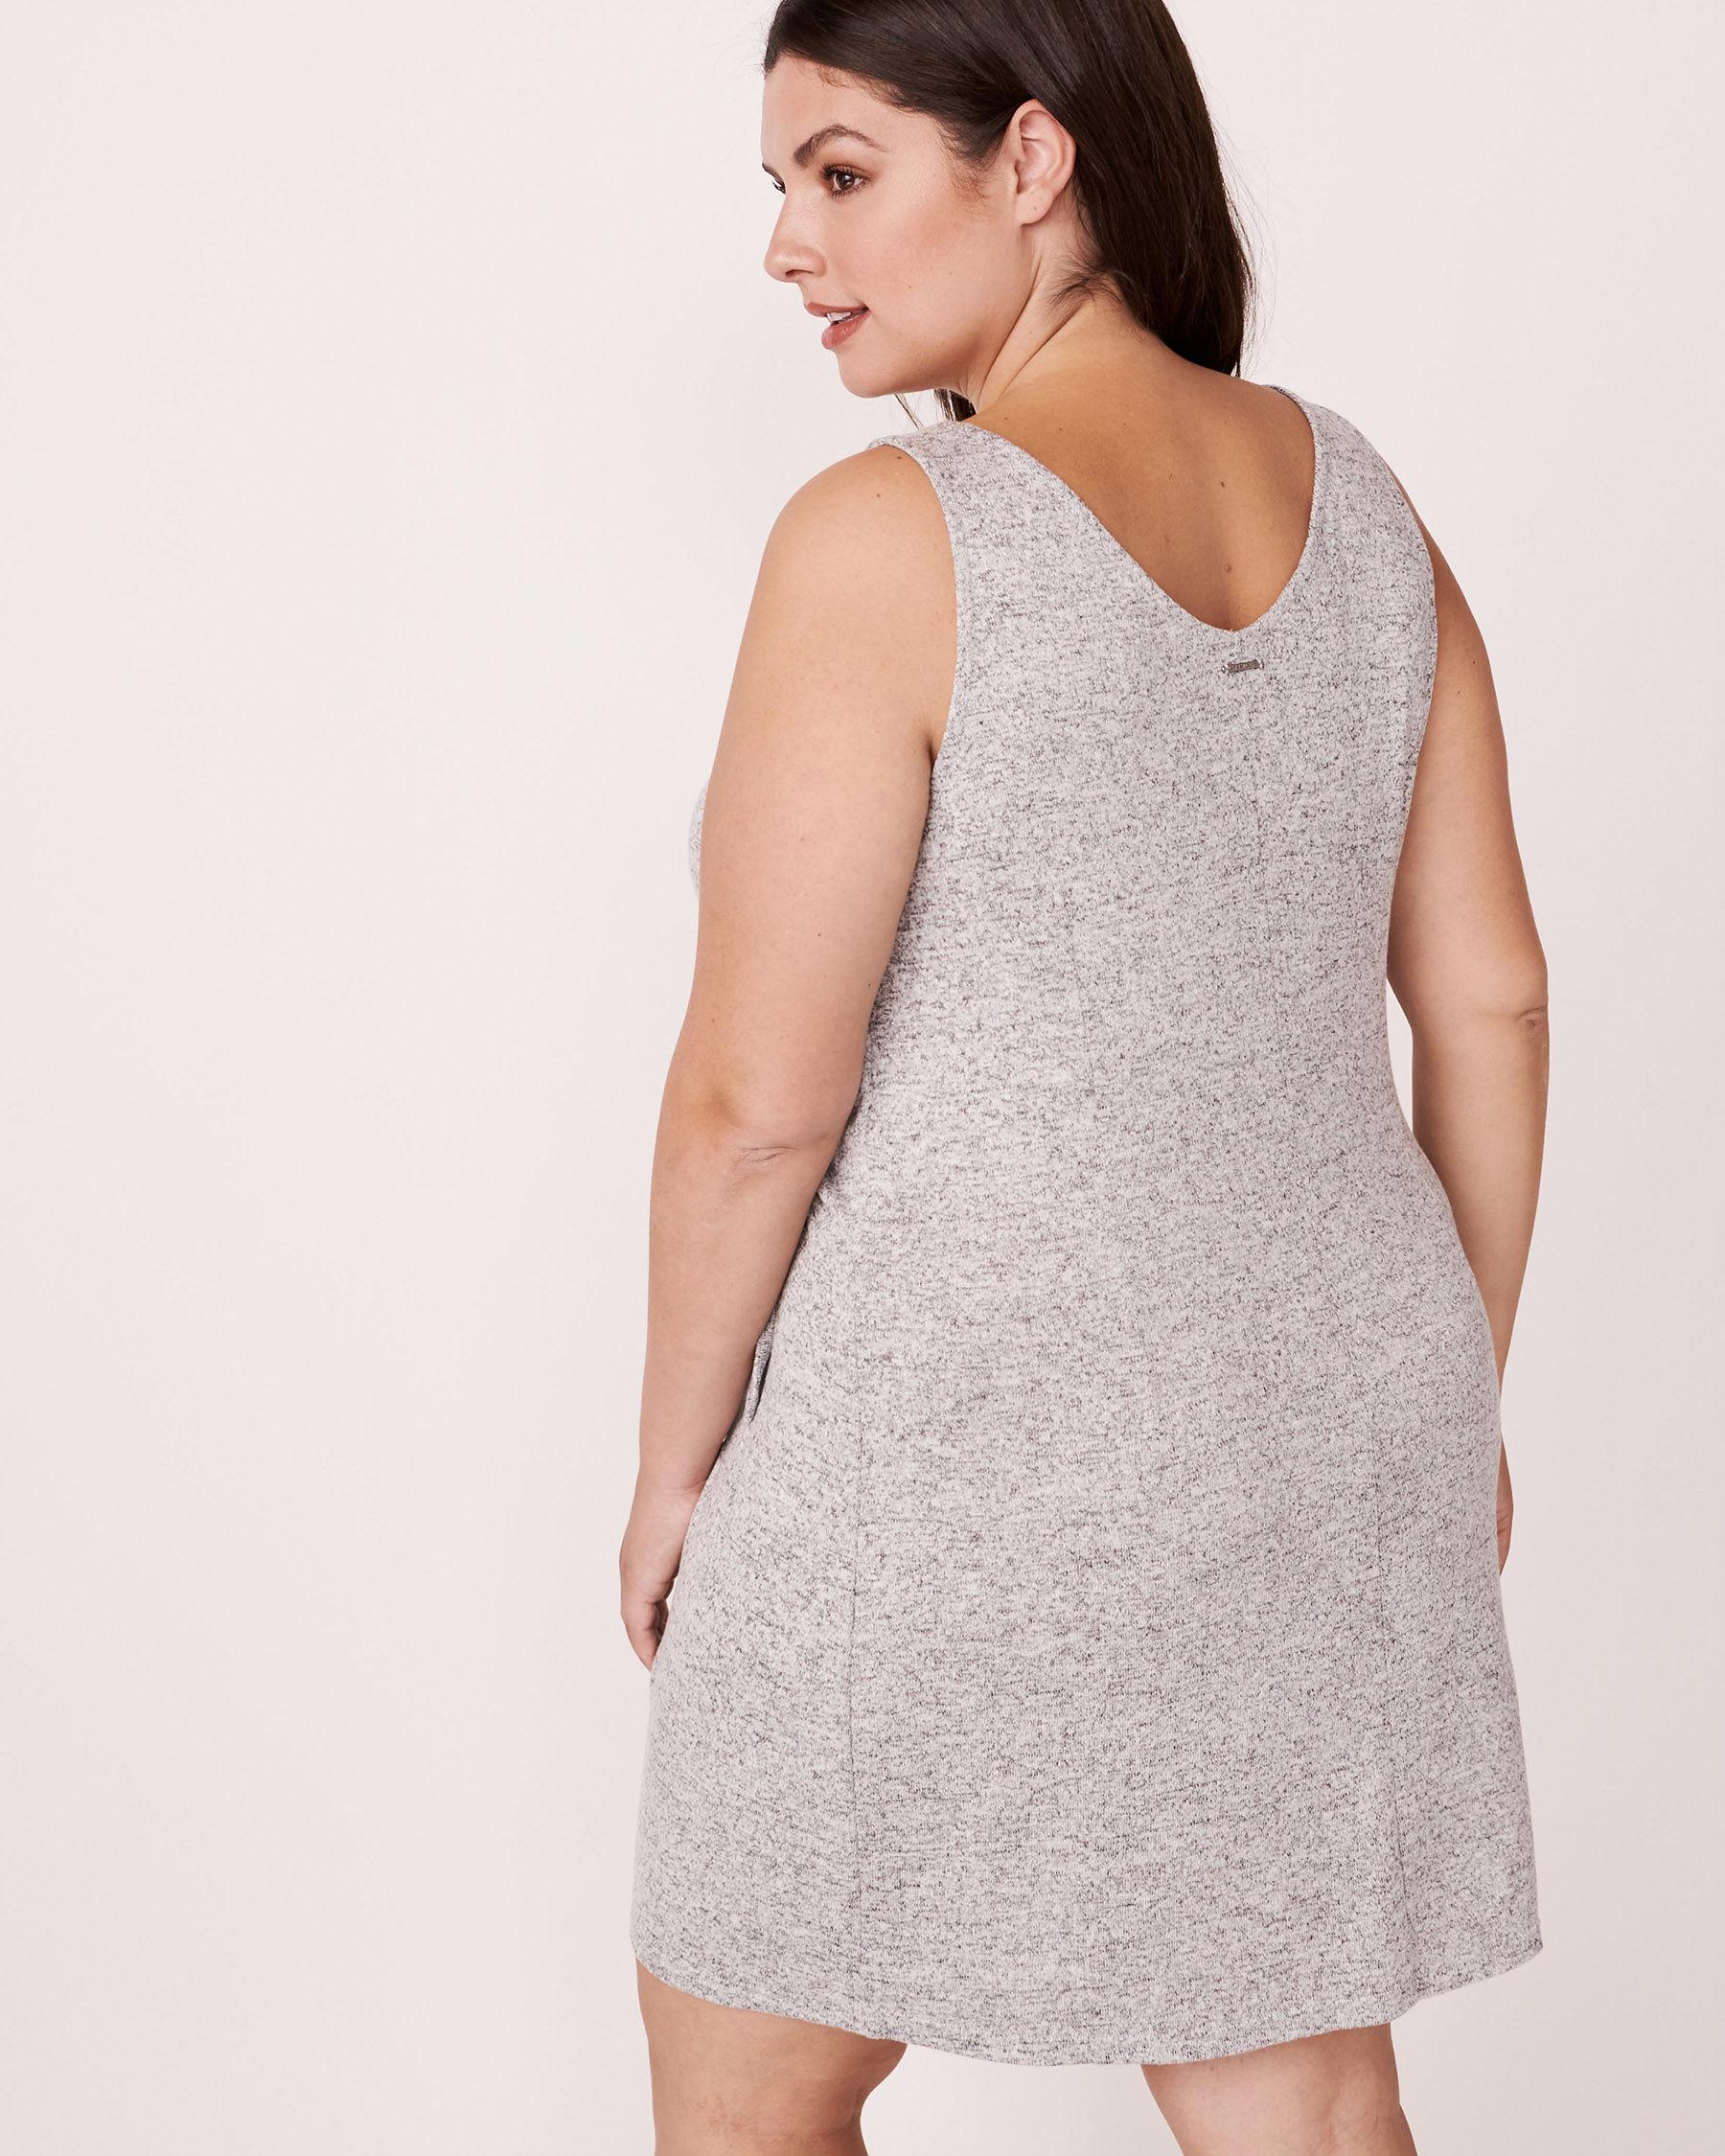 LA VIE EN ROSE Knotted V-neckline Sleeveless Dress Grey 766-474-0-11 - View2